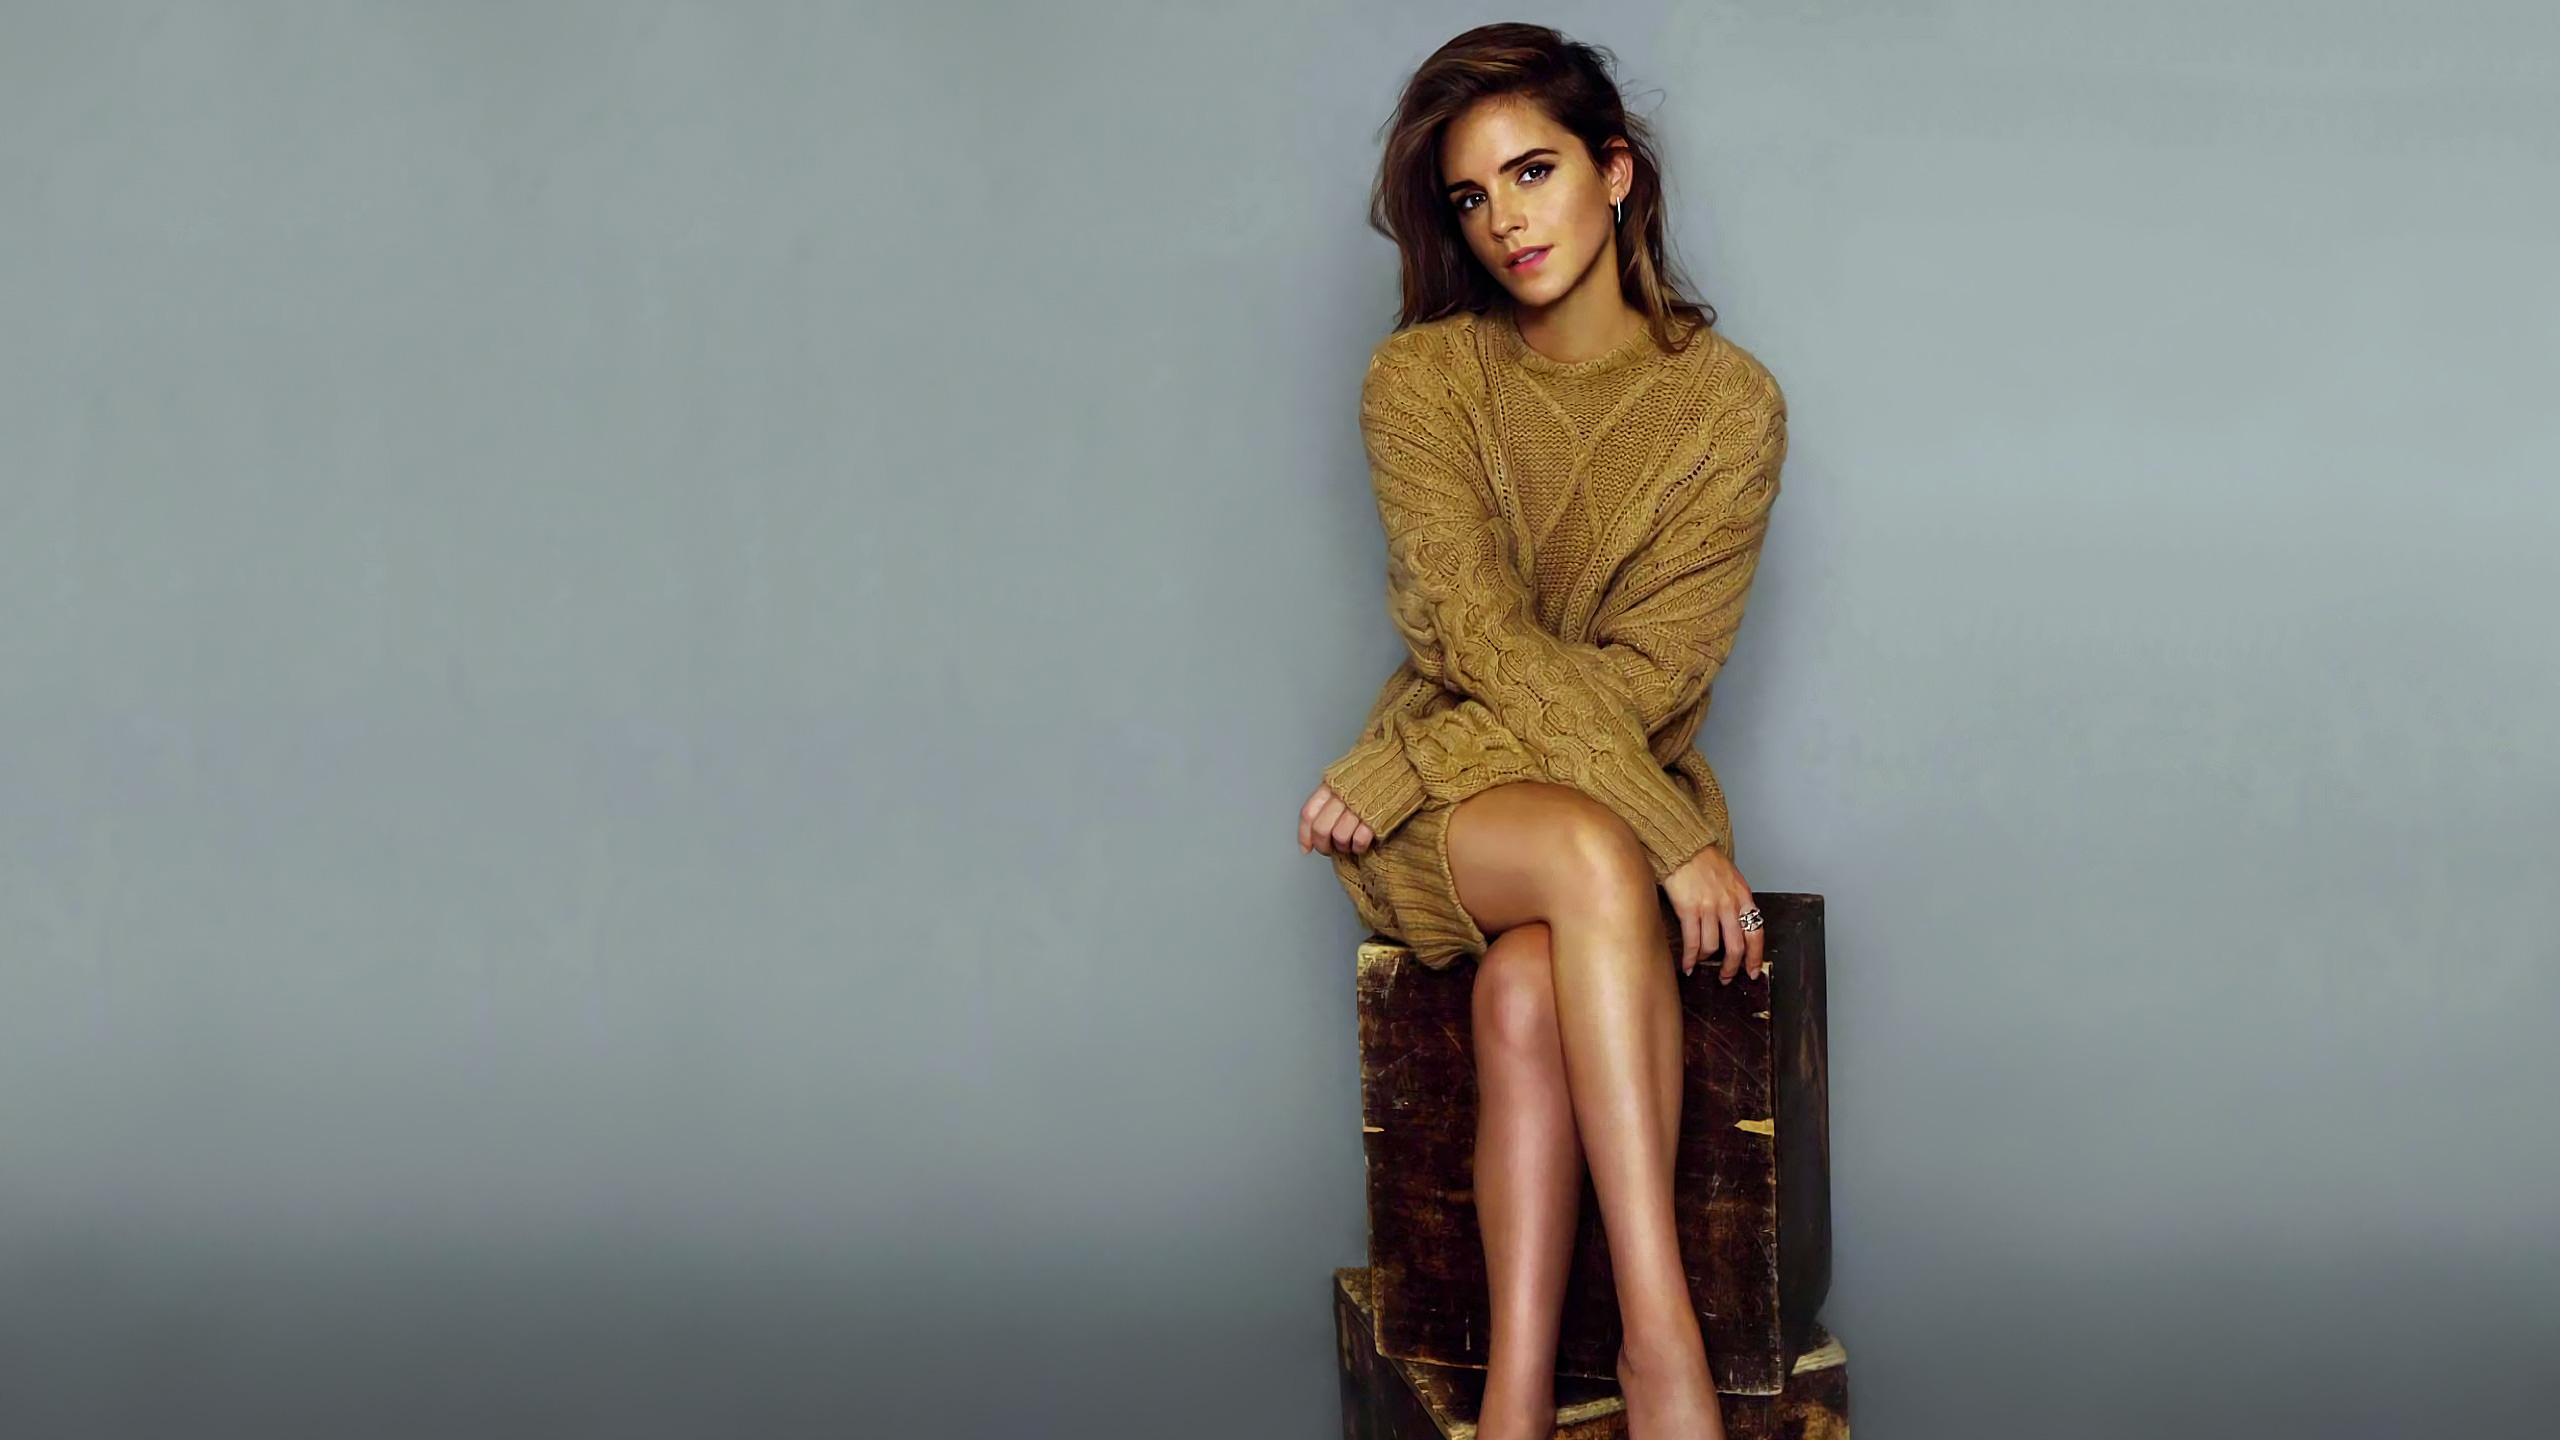 Beautiful Indian Girls Wallpaper Desktop Emma Watson 19 Hd Celebrities 4k Wallpapers Images